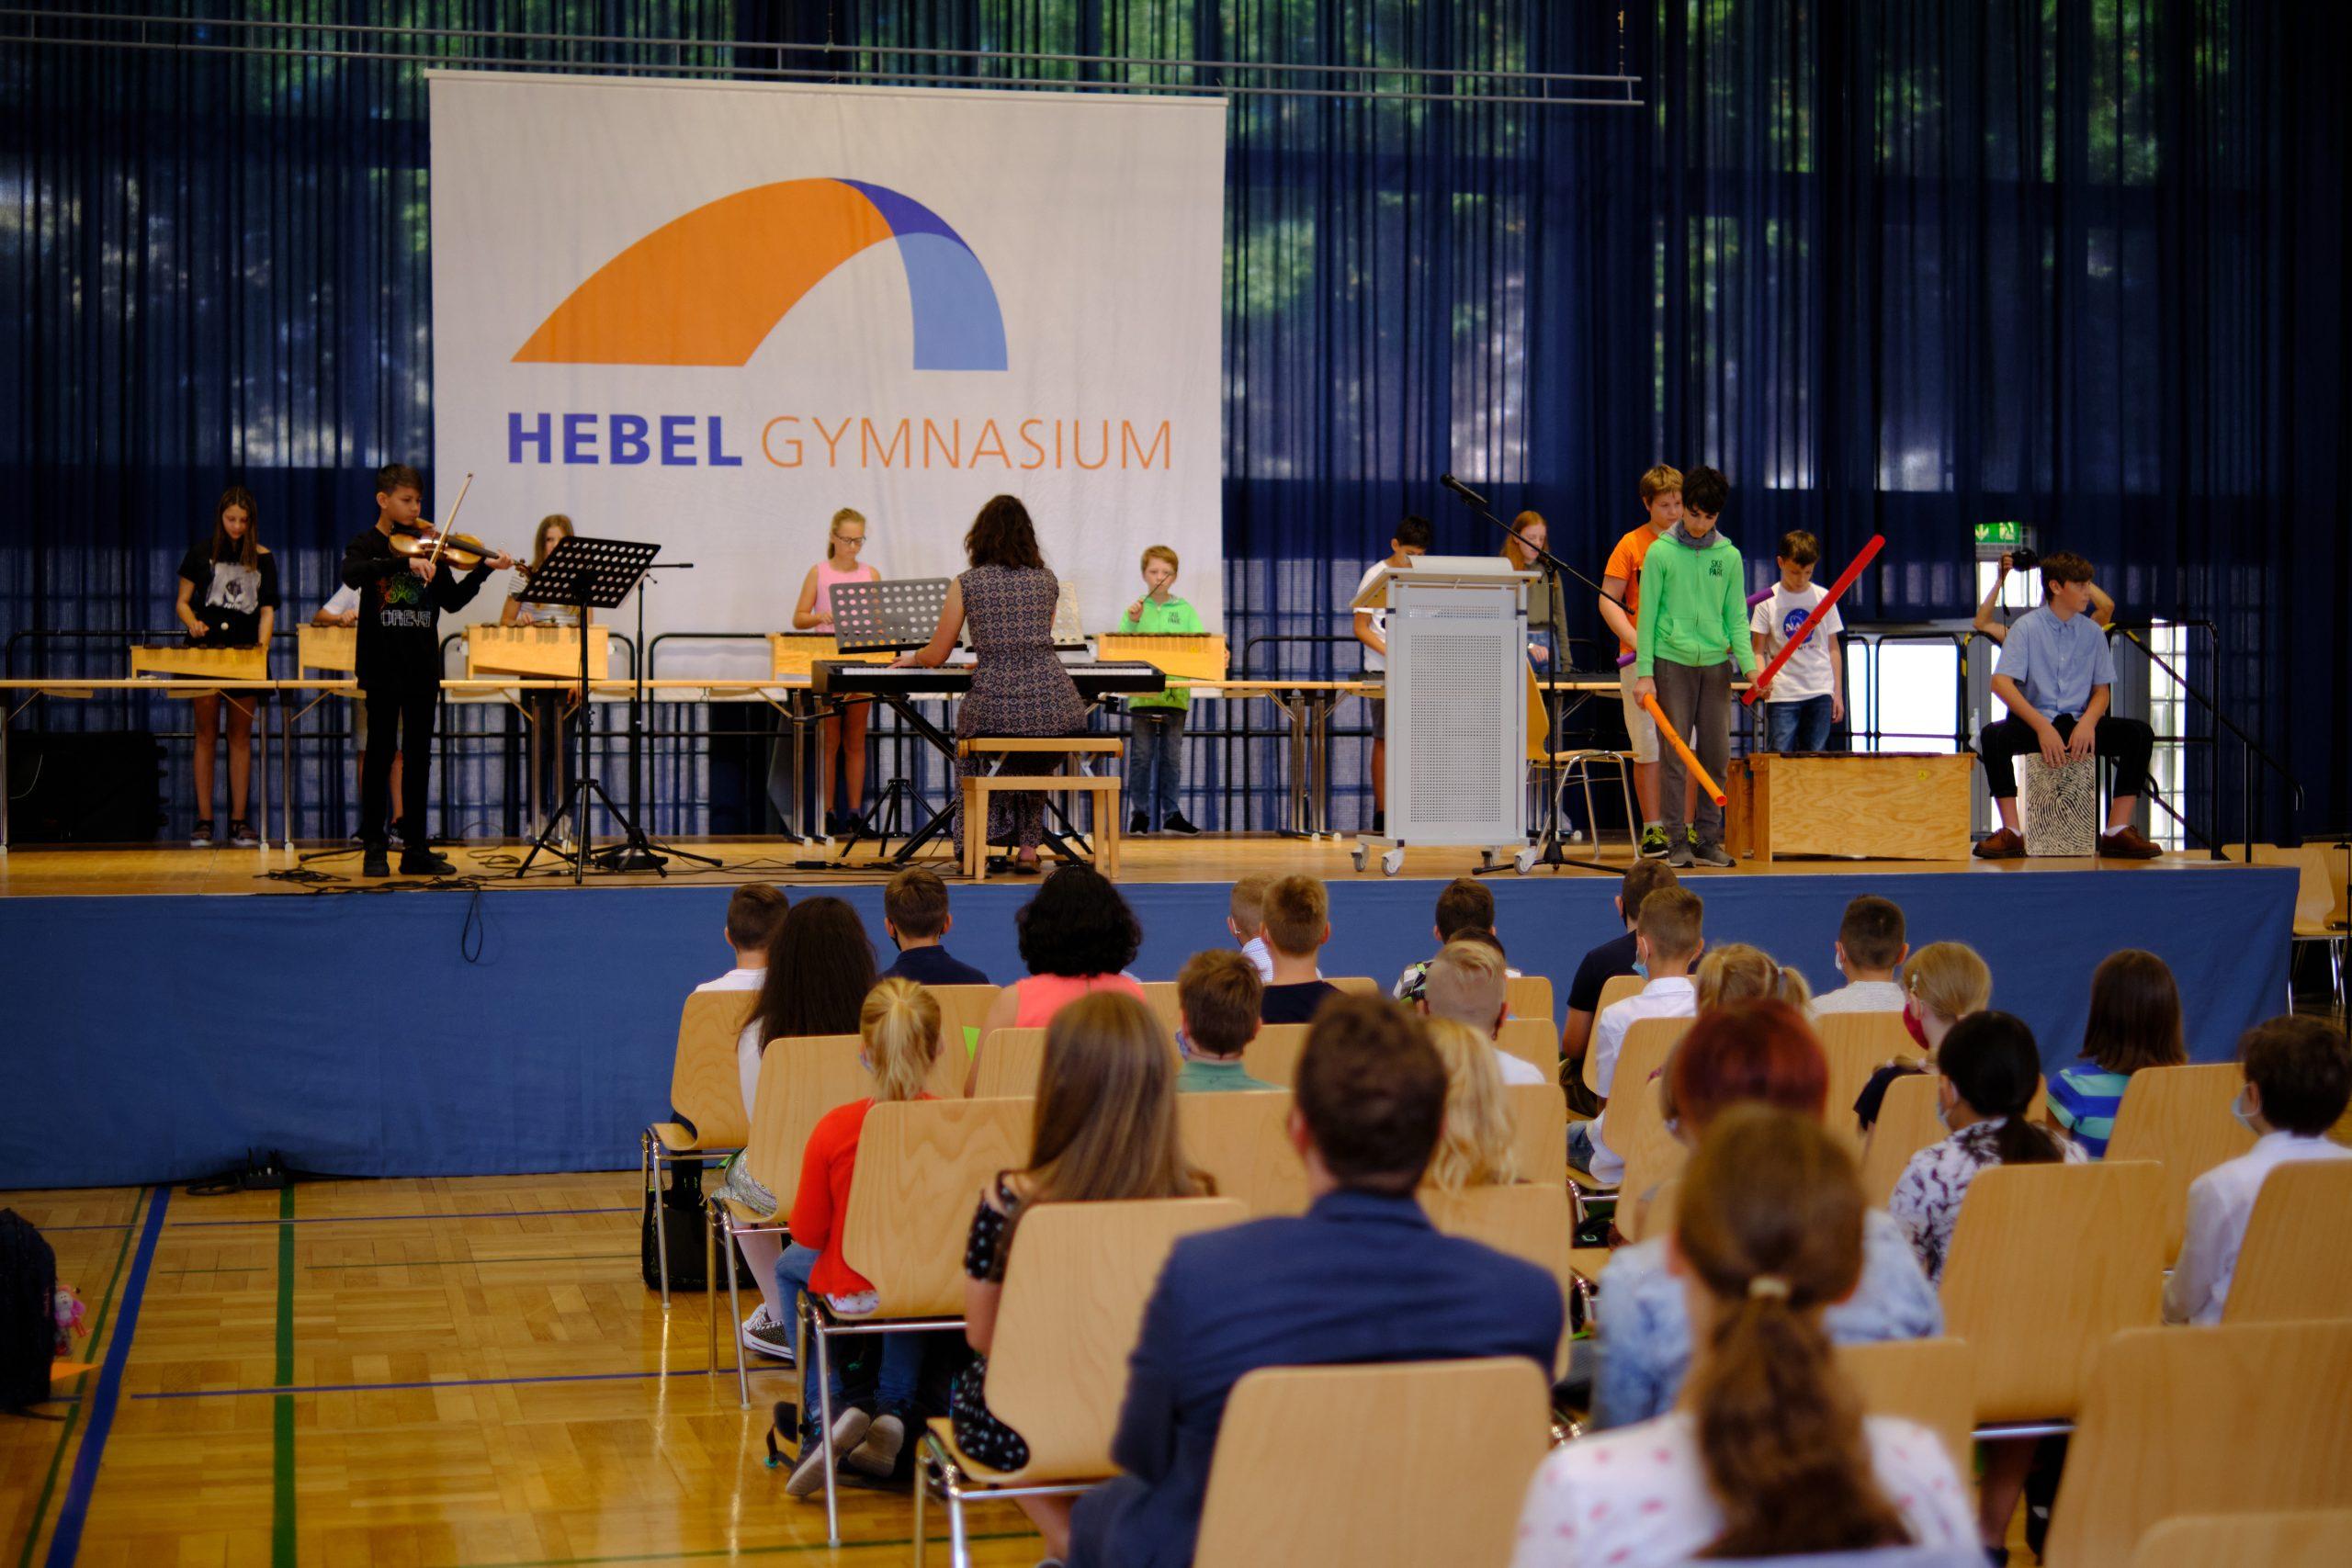 Einschulungsfeier 2020: Willkommen am Hebel!